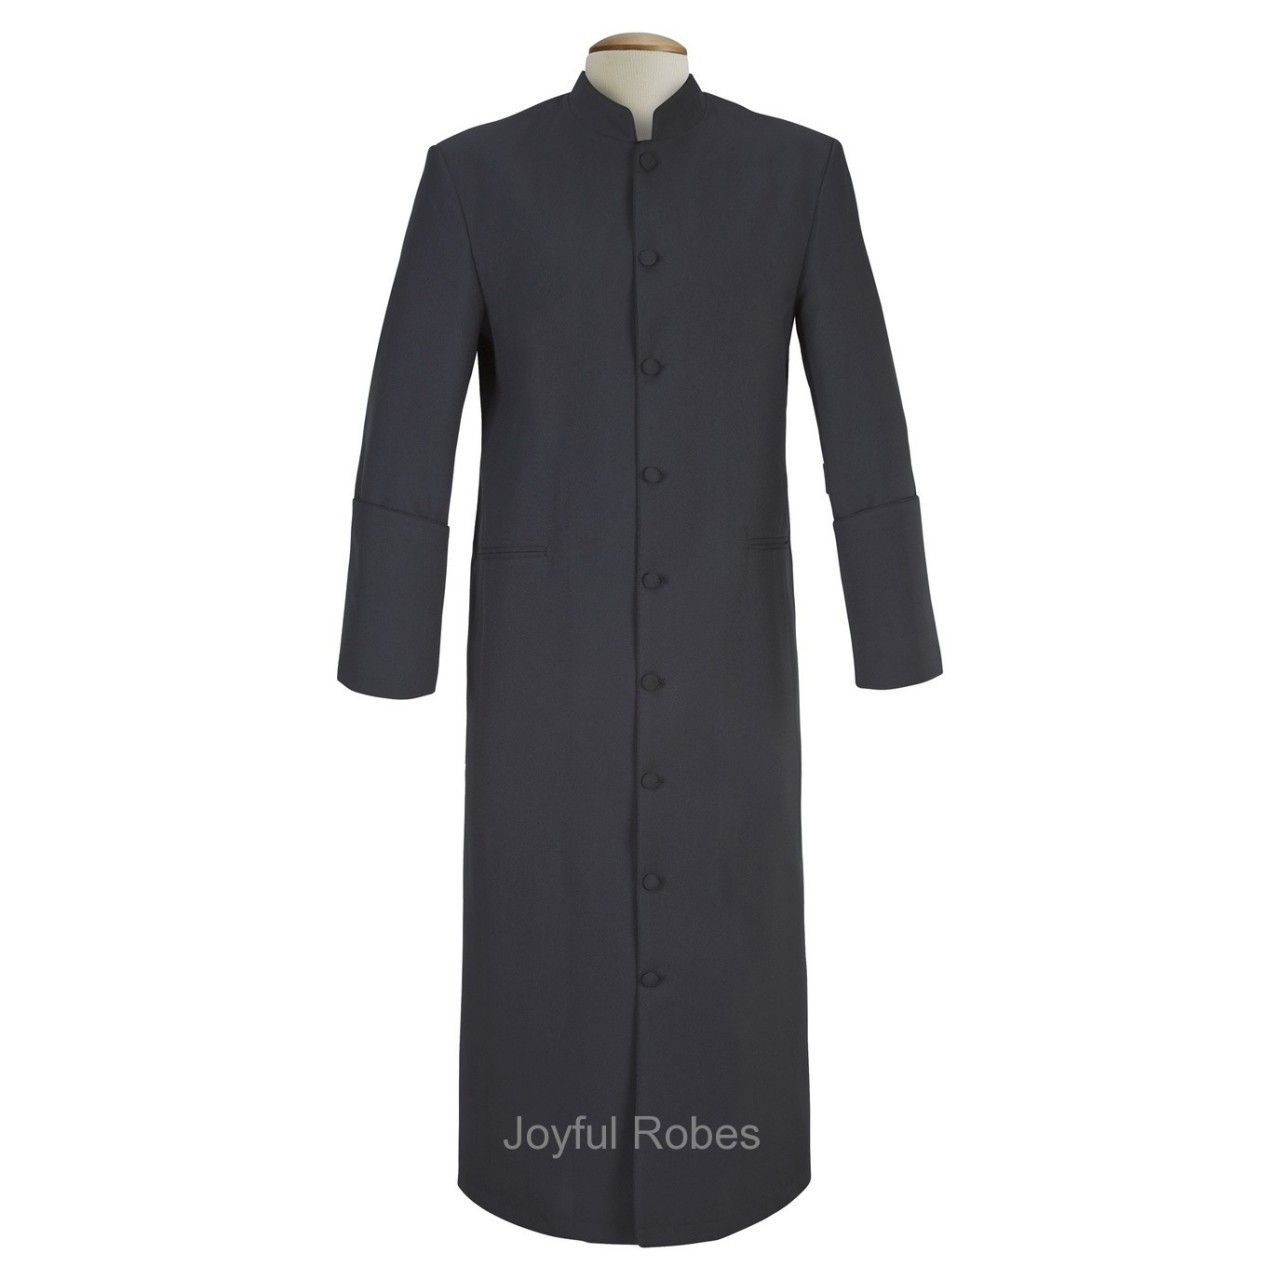 101 M. Men's Pastor/Clergy Robe Solid Black